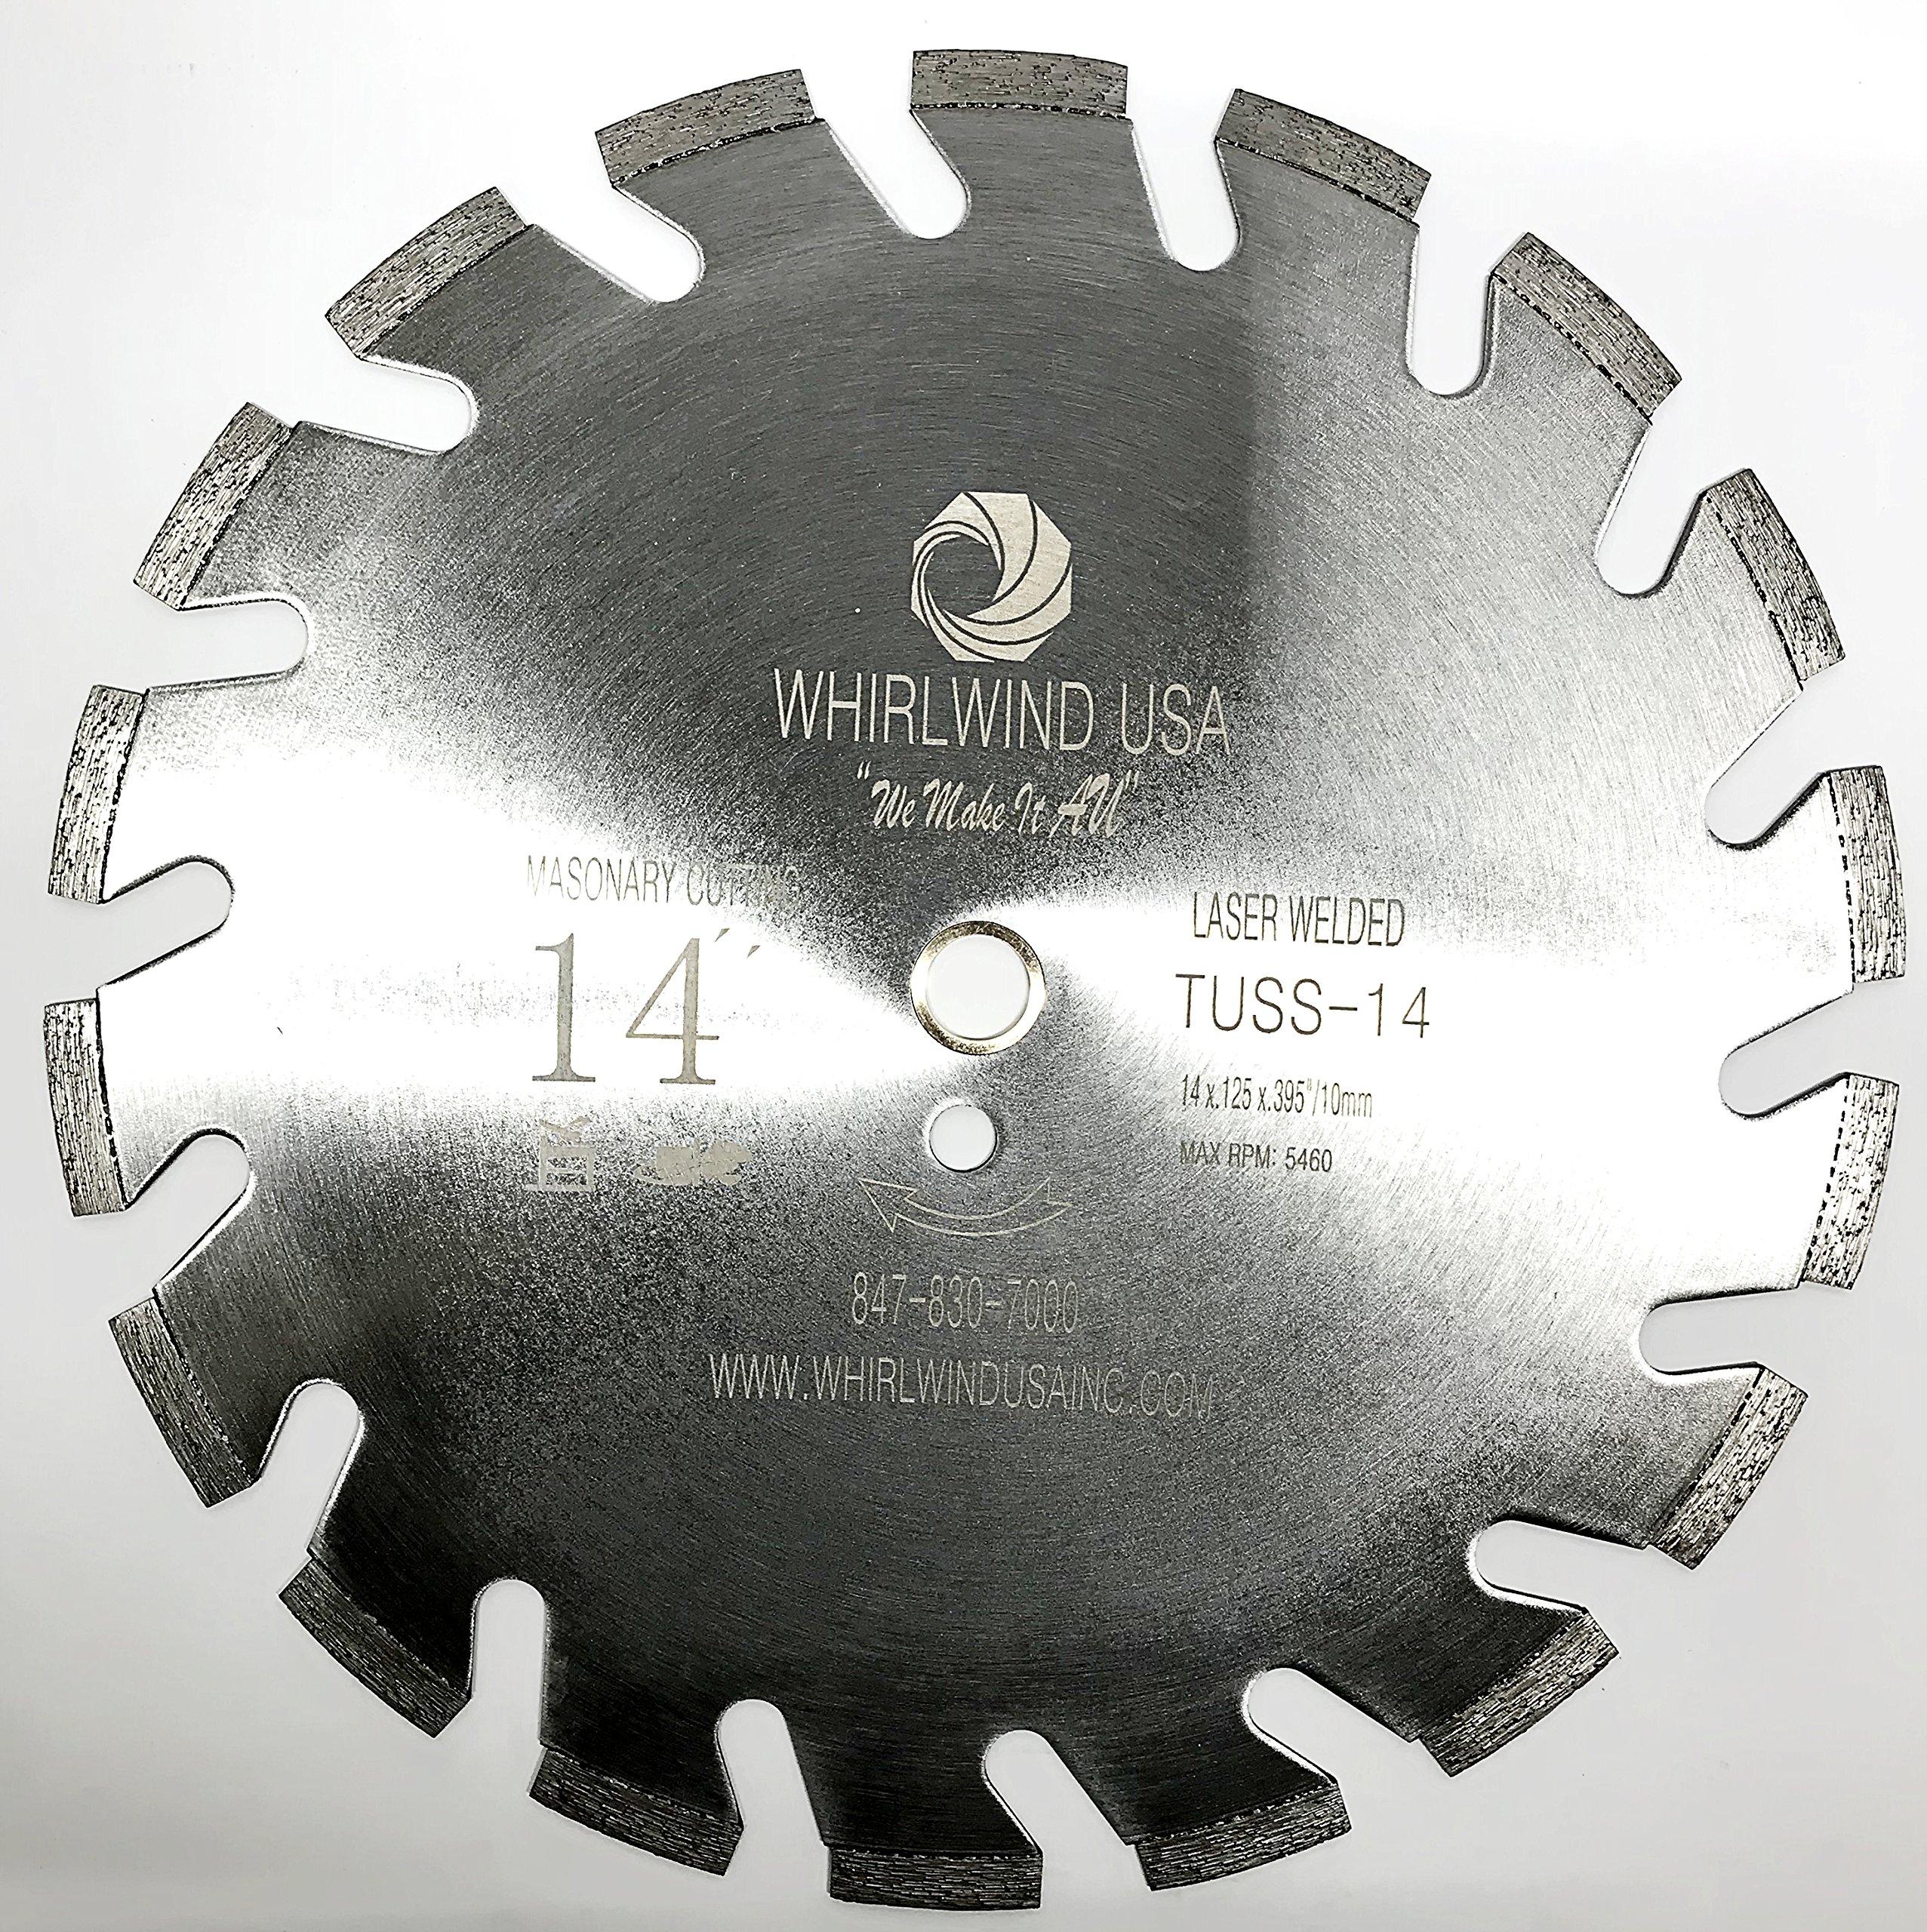 Whirlwind USA TUSS 14 inch U Slot Laser Welded Dry or Wet Power Saw Segmented Masonry Diamond Blades (Factory Direct Sale) (TUSS 14'')